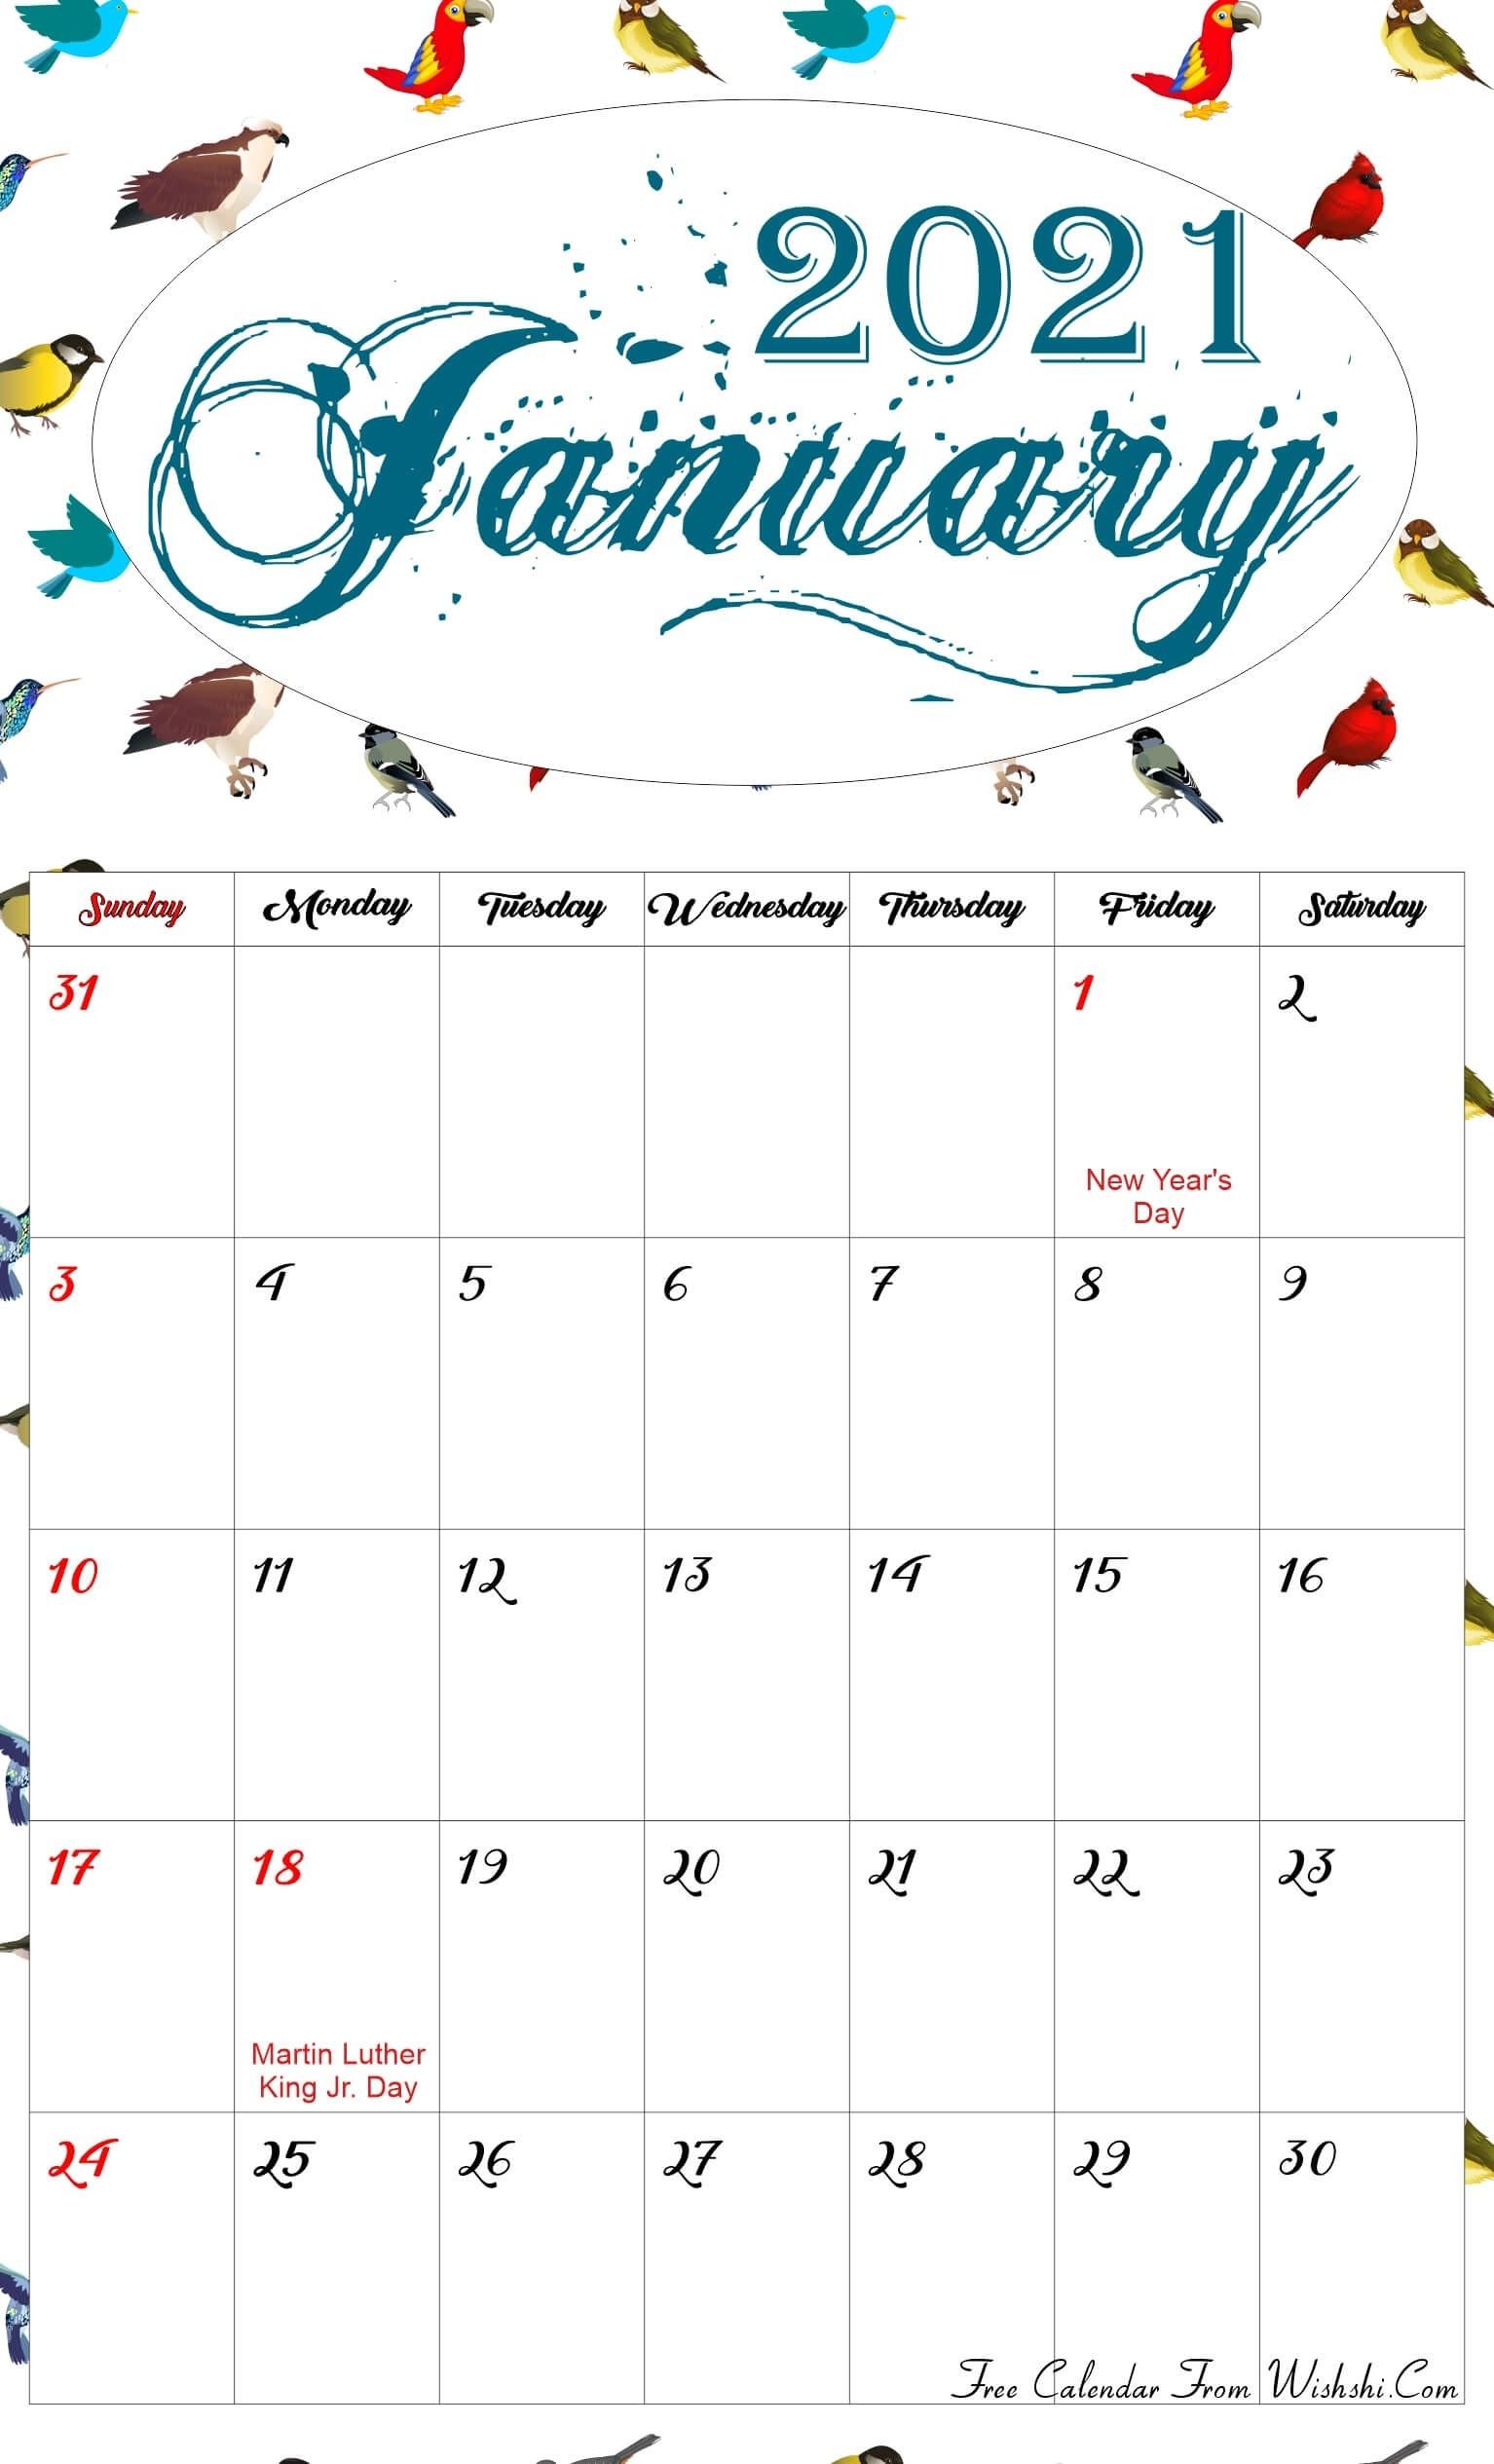 Floral January 2021 Calendar Printable - Free Printable  Girly Monthly Calendar Printable 2021